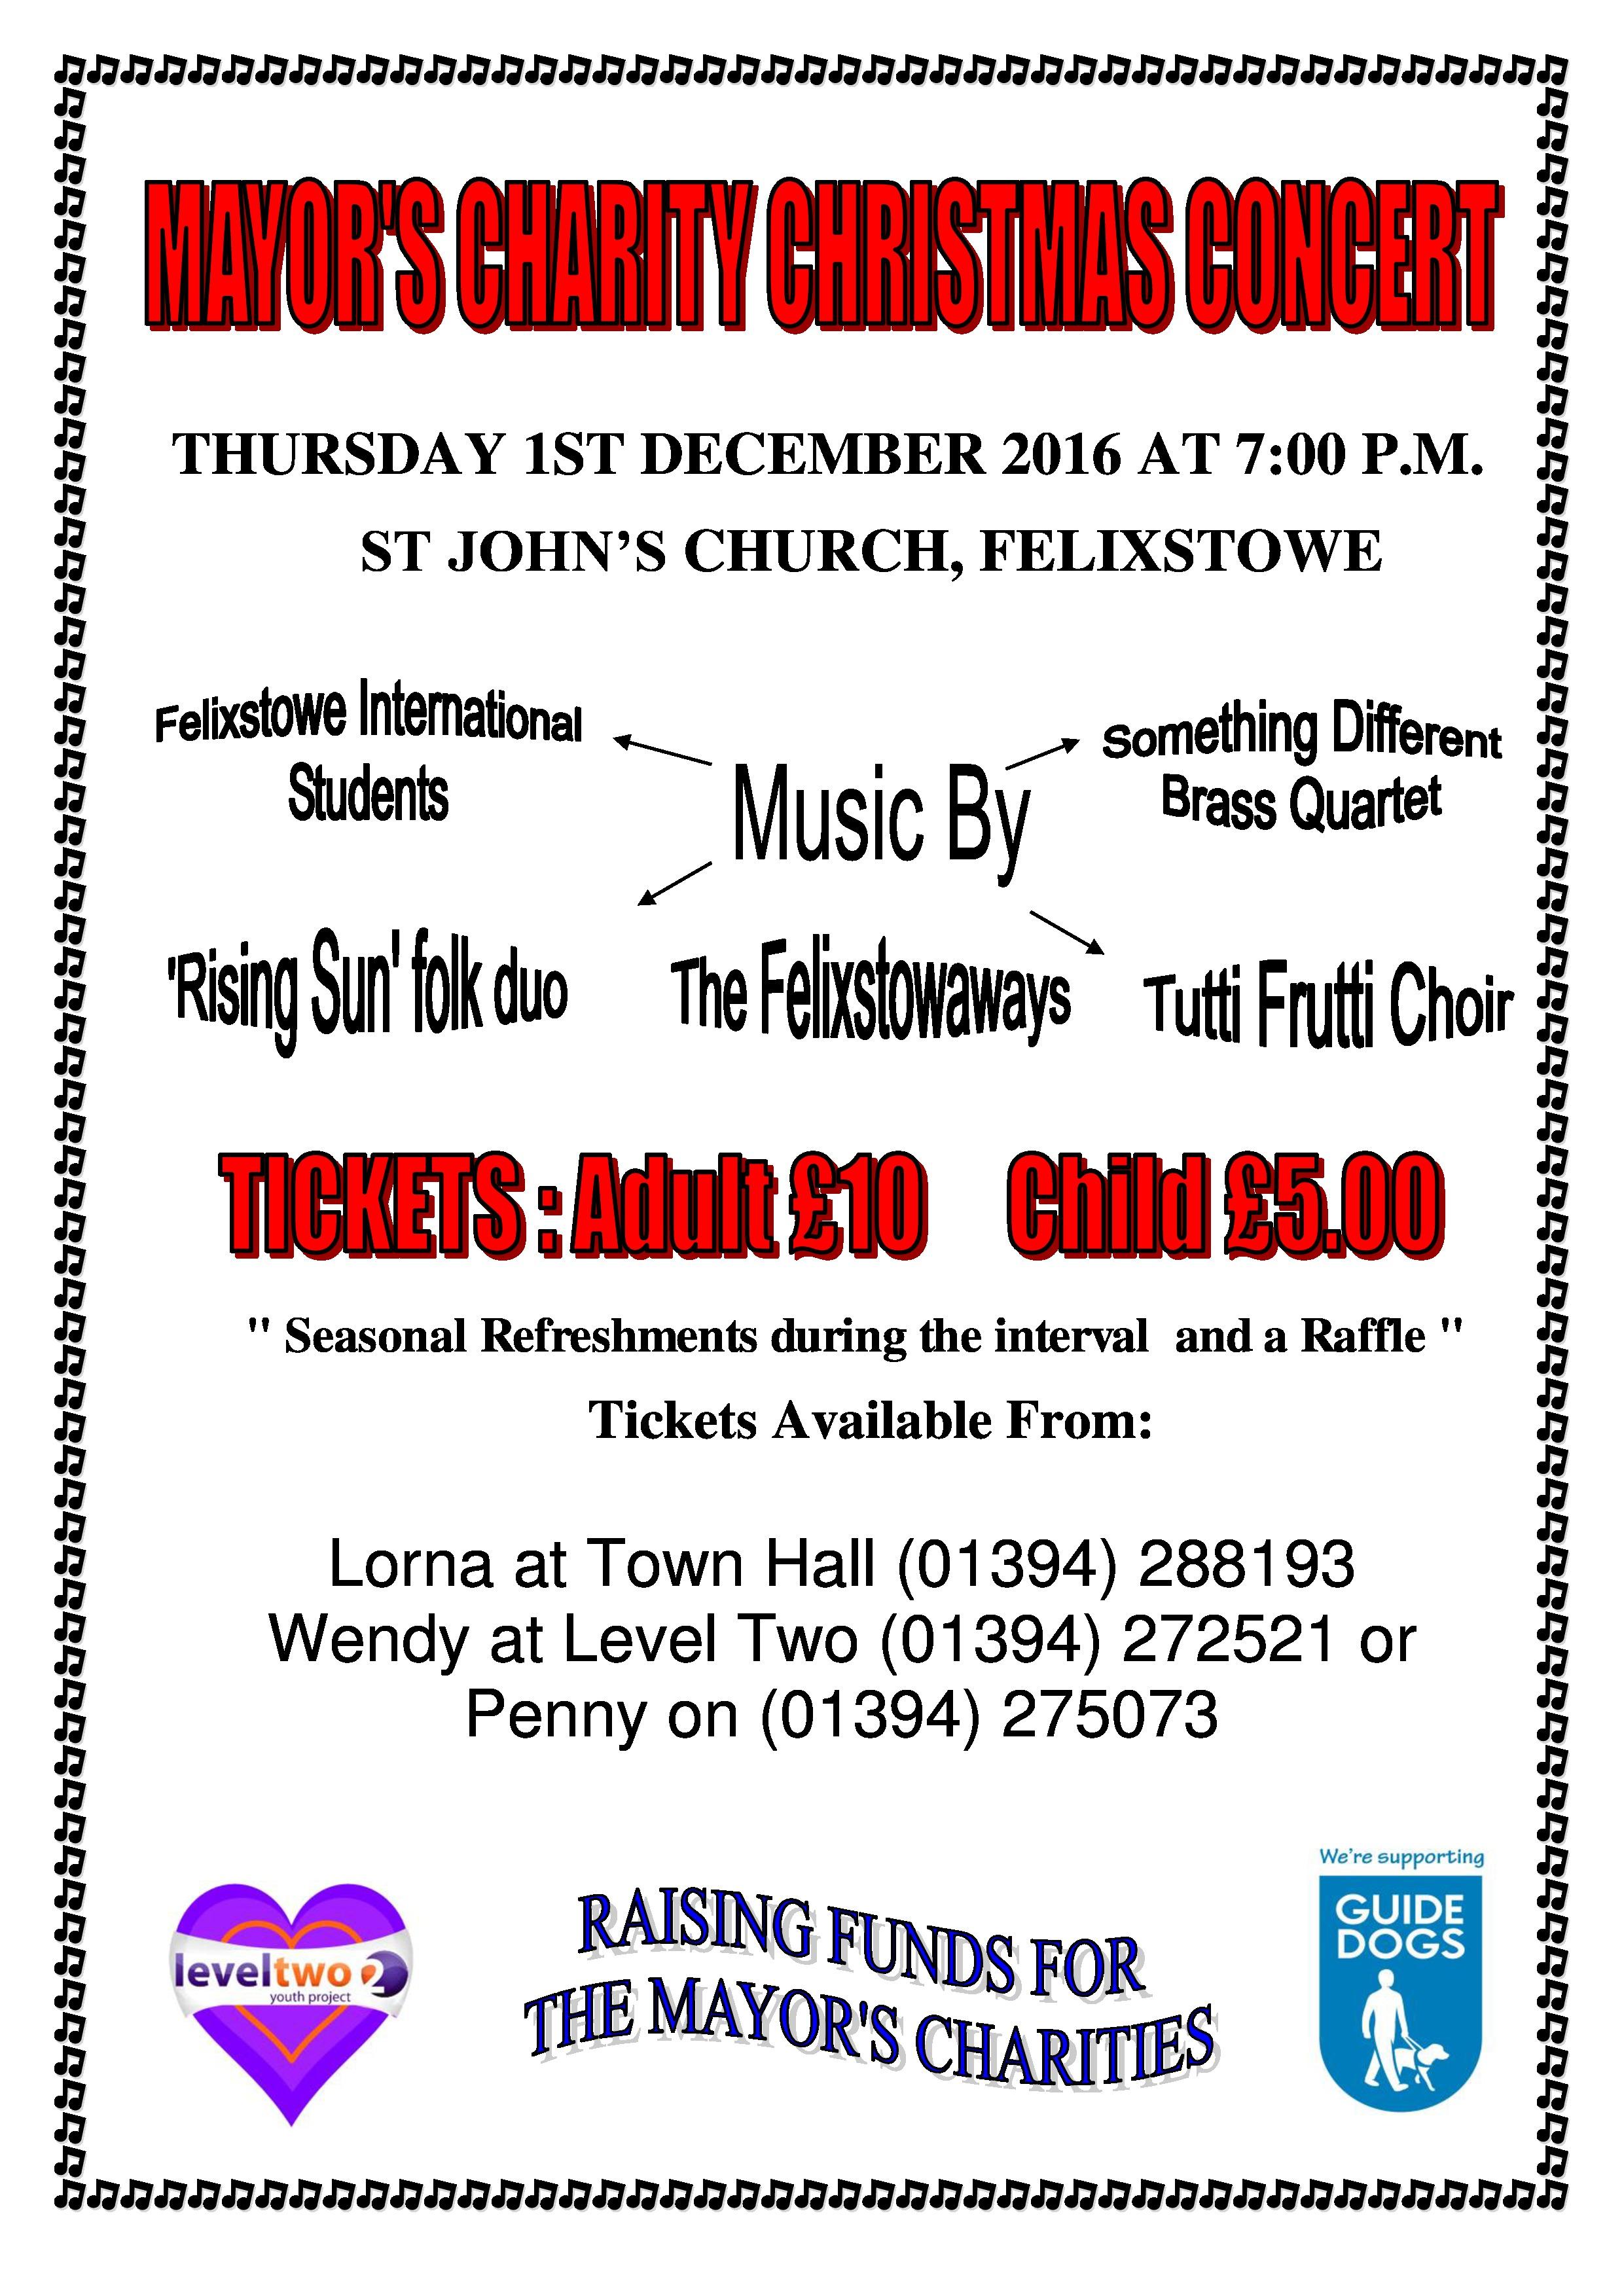 flyer for ors charity christmas concert st dec level two flyer for ors charity christmas concert 1st dec 2016